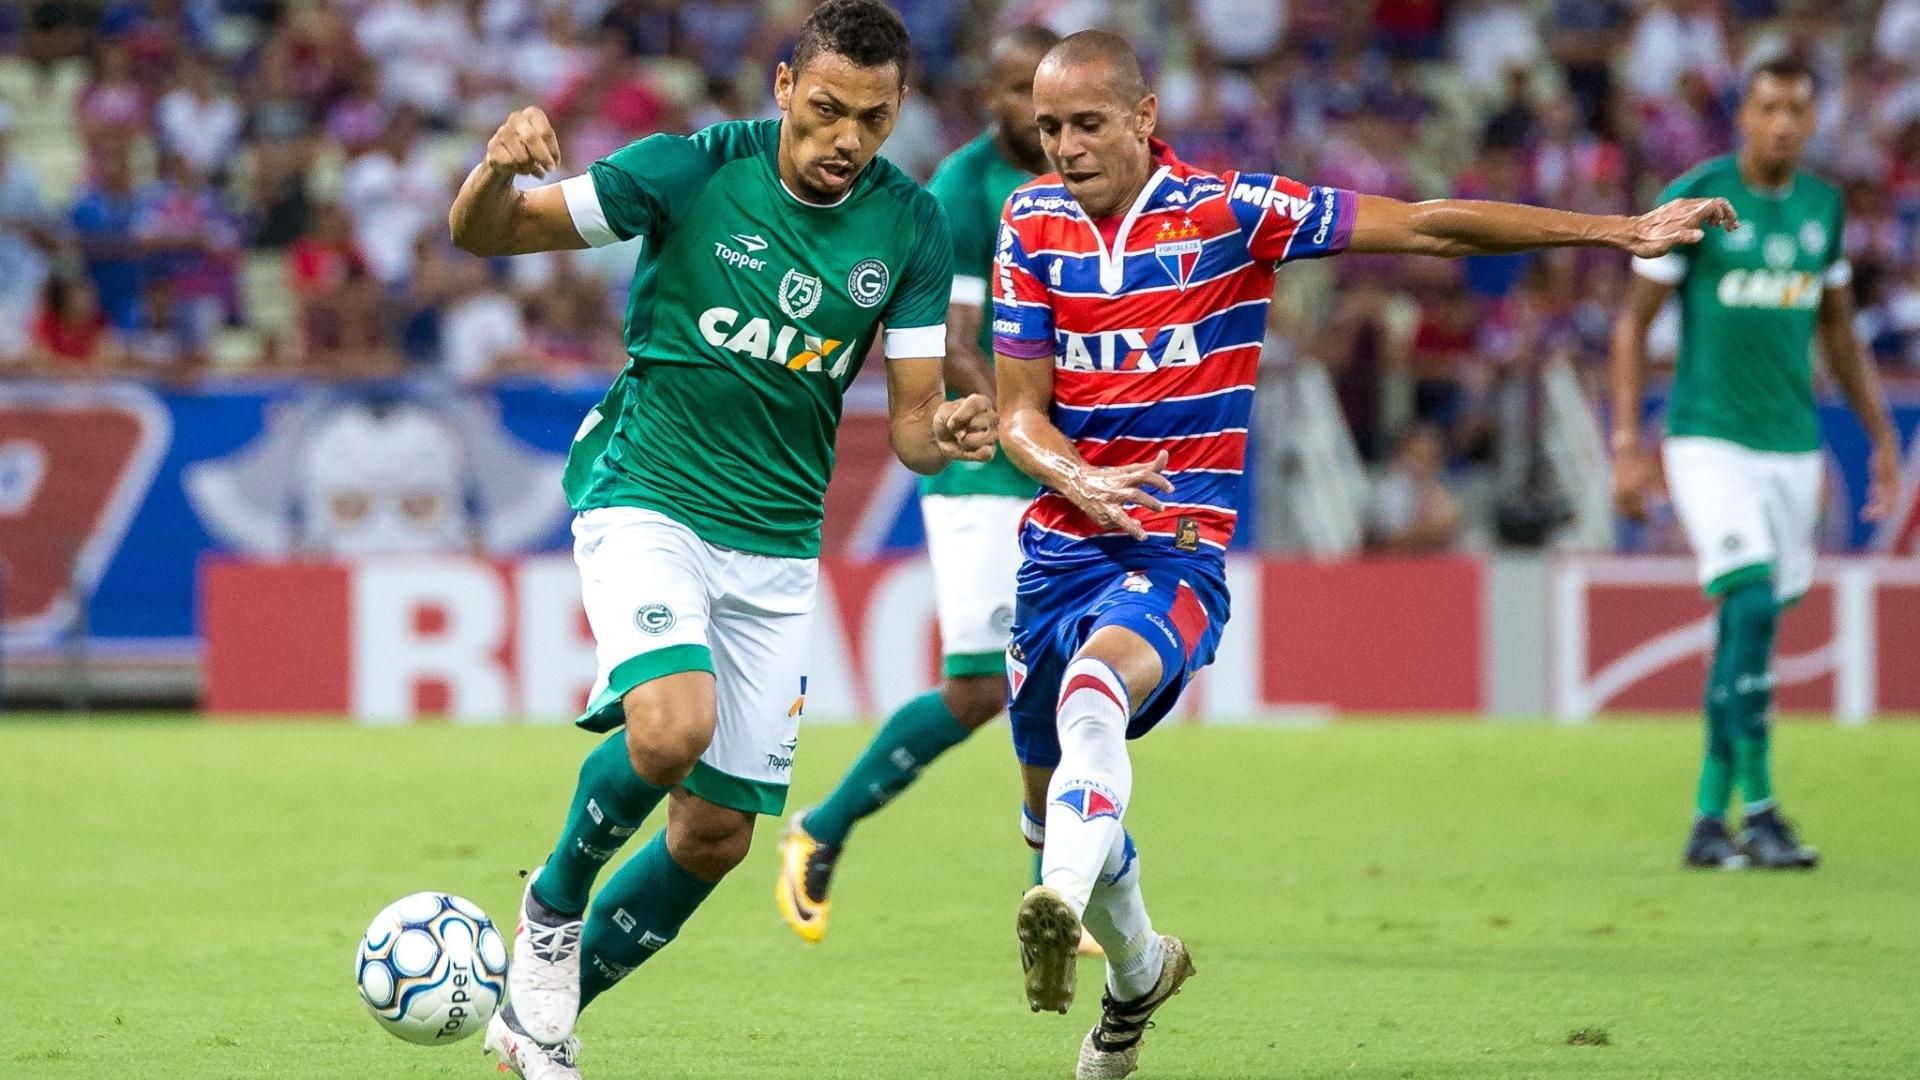 Alex Silva e Darley disputam bola durante Fortaleza x Goiás